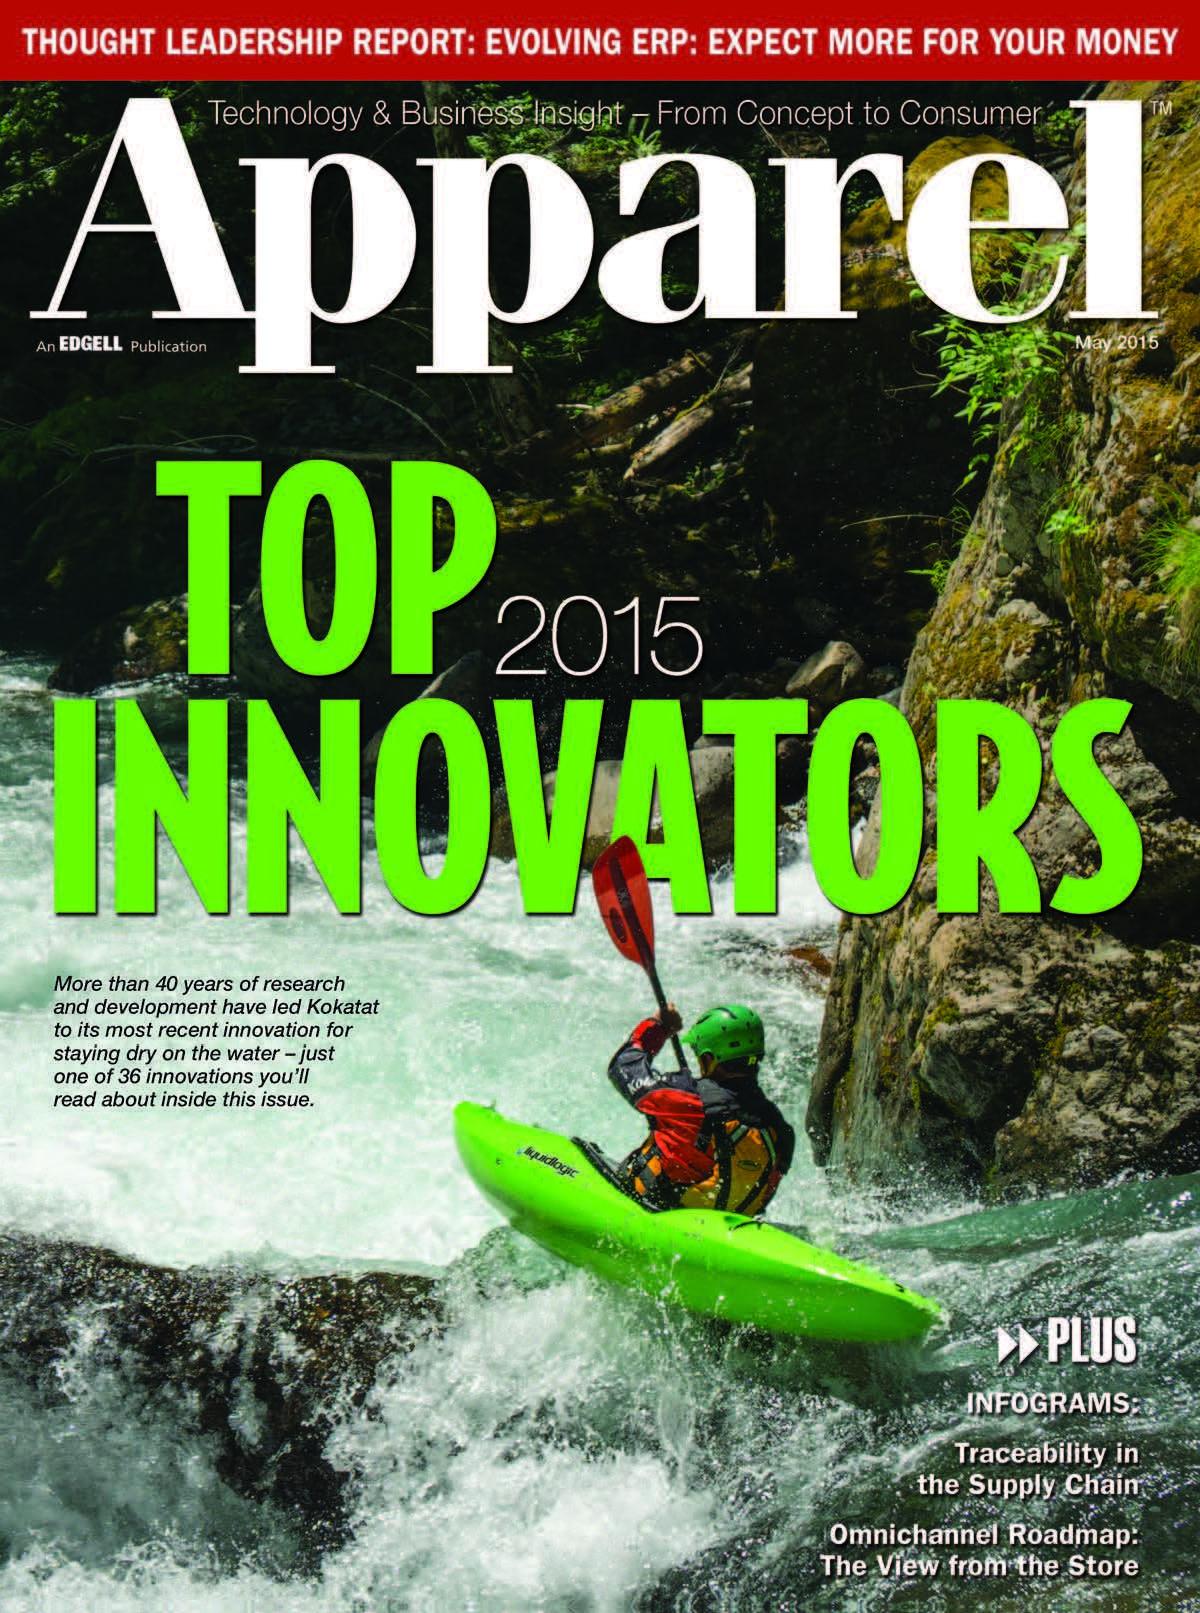 apparel-innovators-awards-2015-2an-page-1.jpg